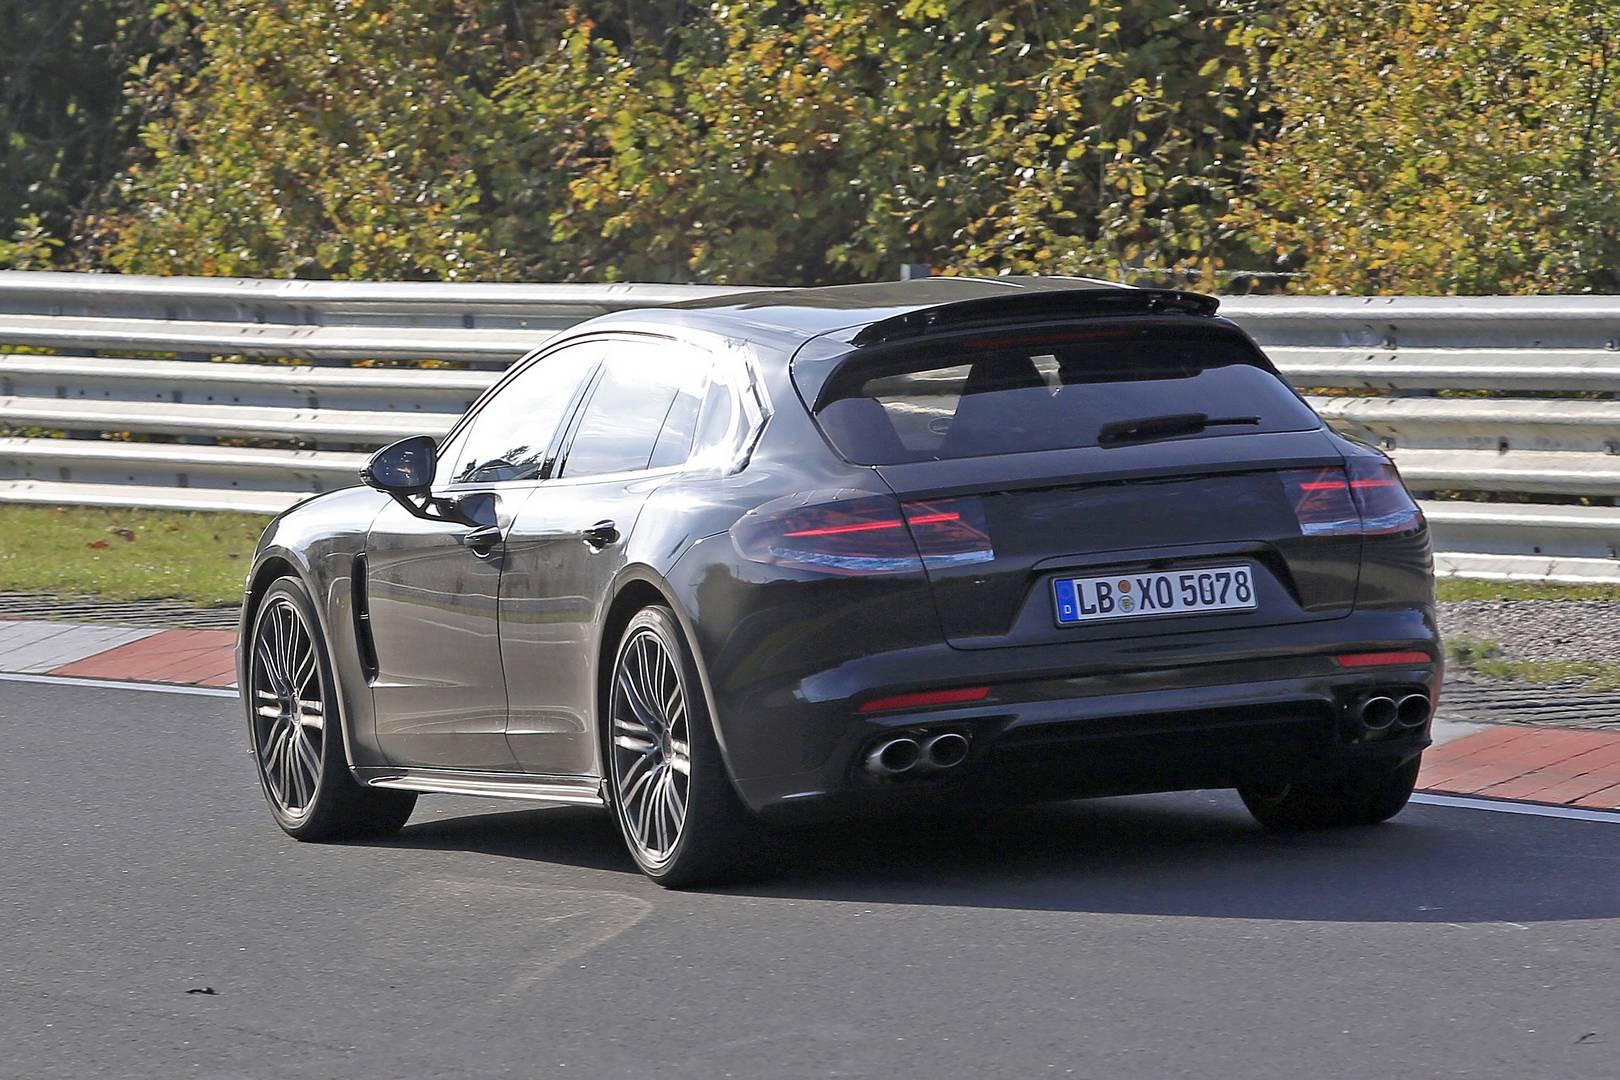 2018 porsche panamera shooting brake latest spy shots gtspirit - Porsche Panamera Shooting Brake